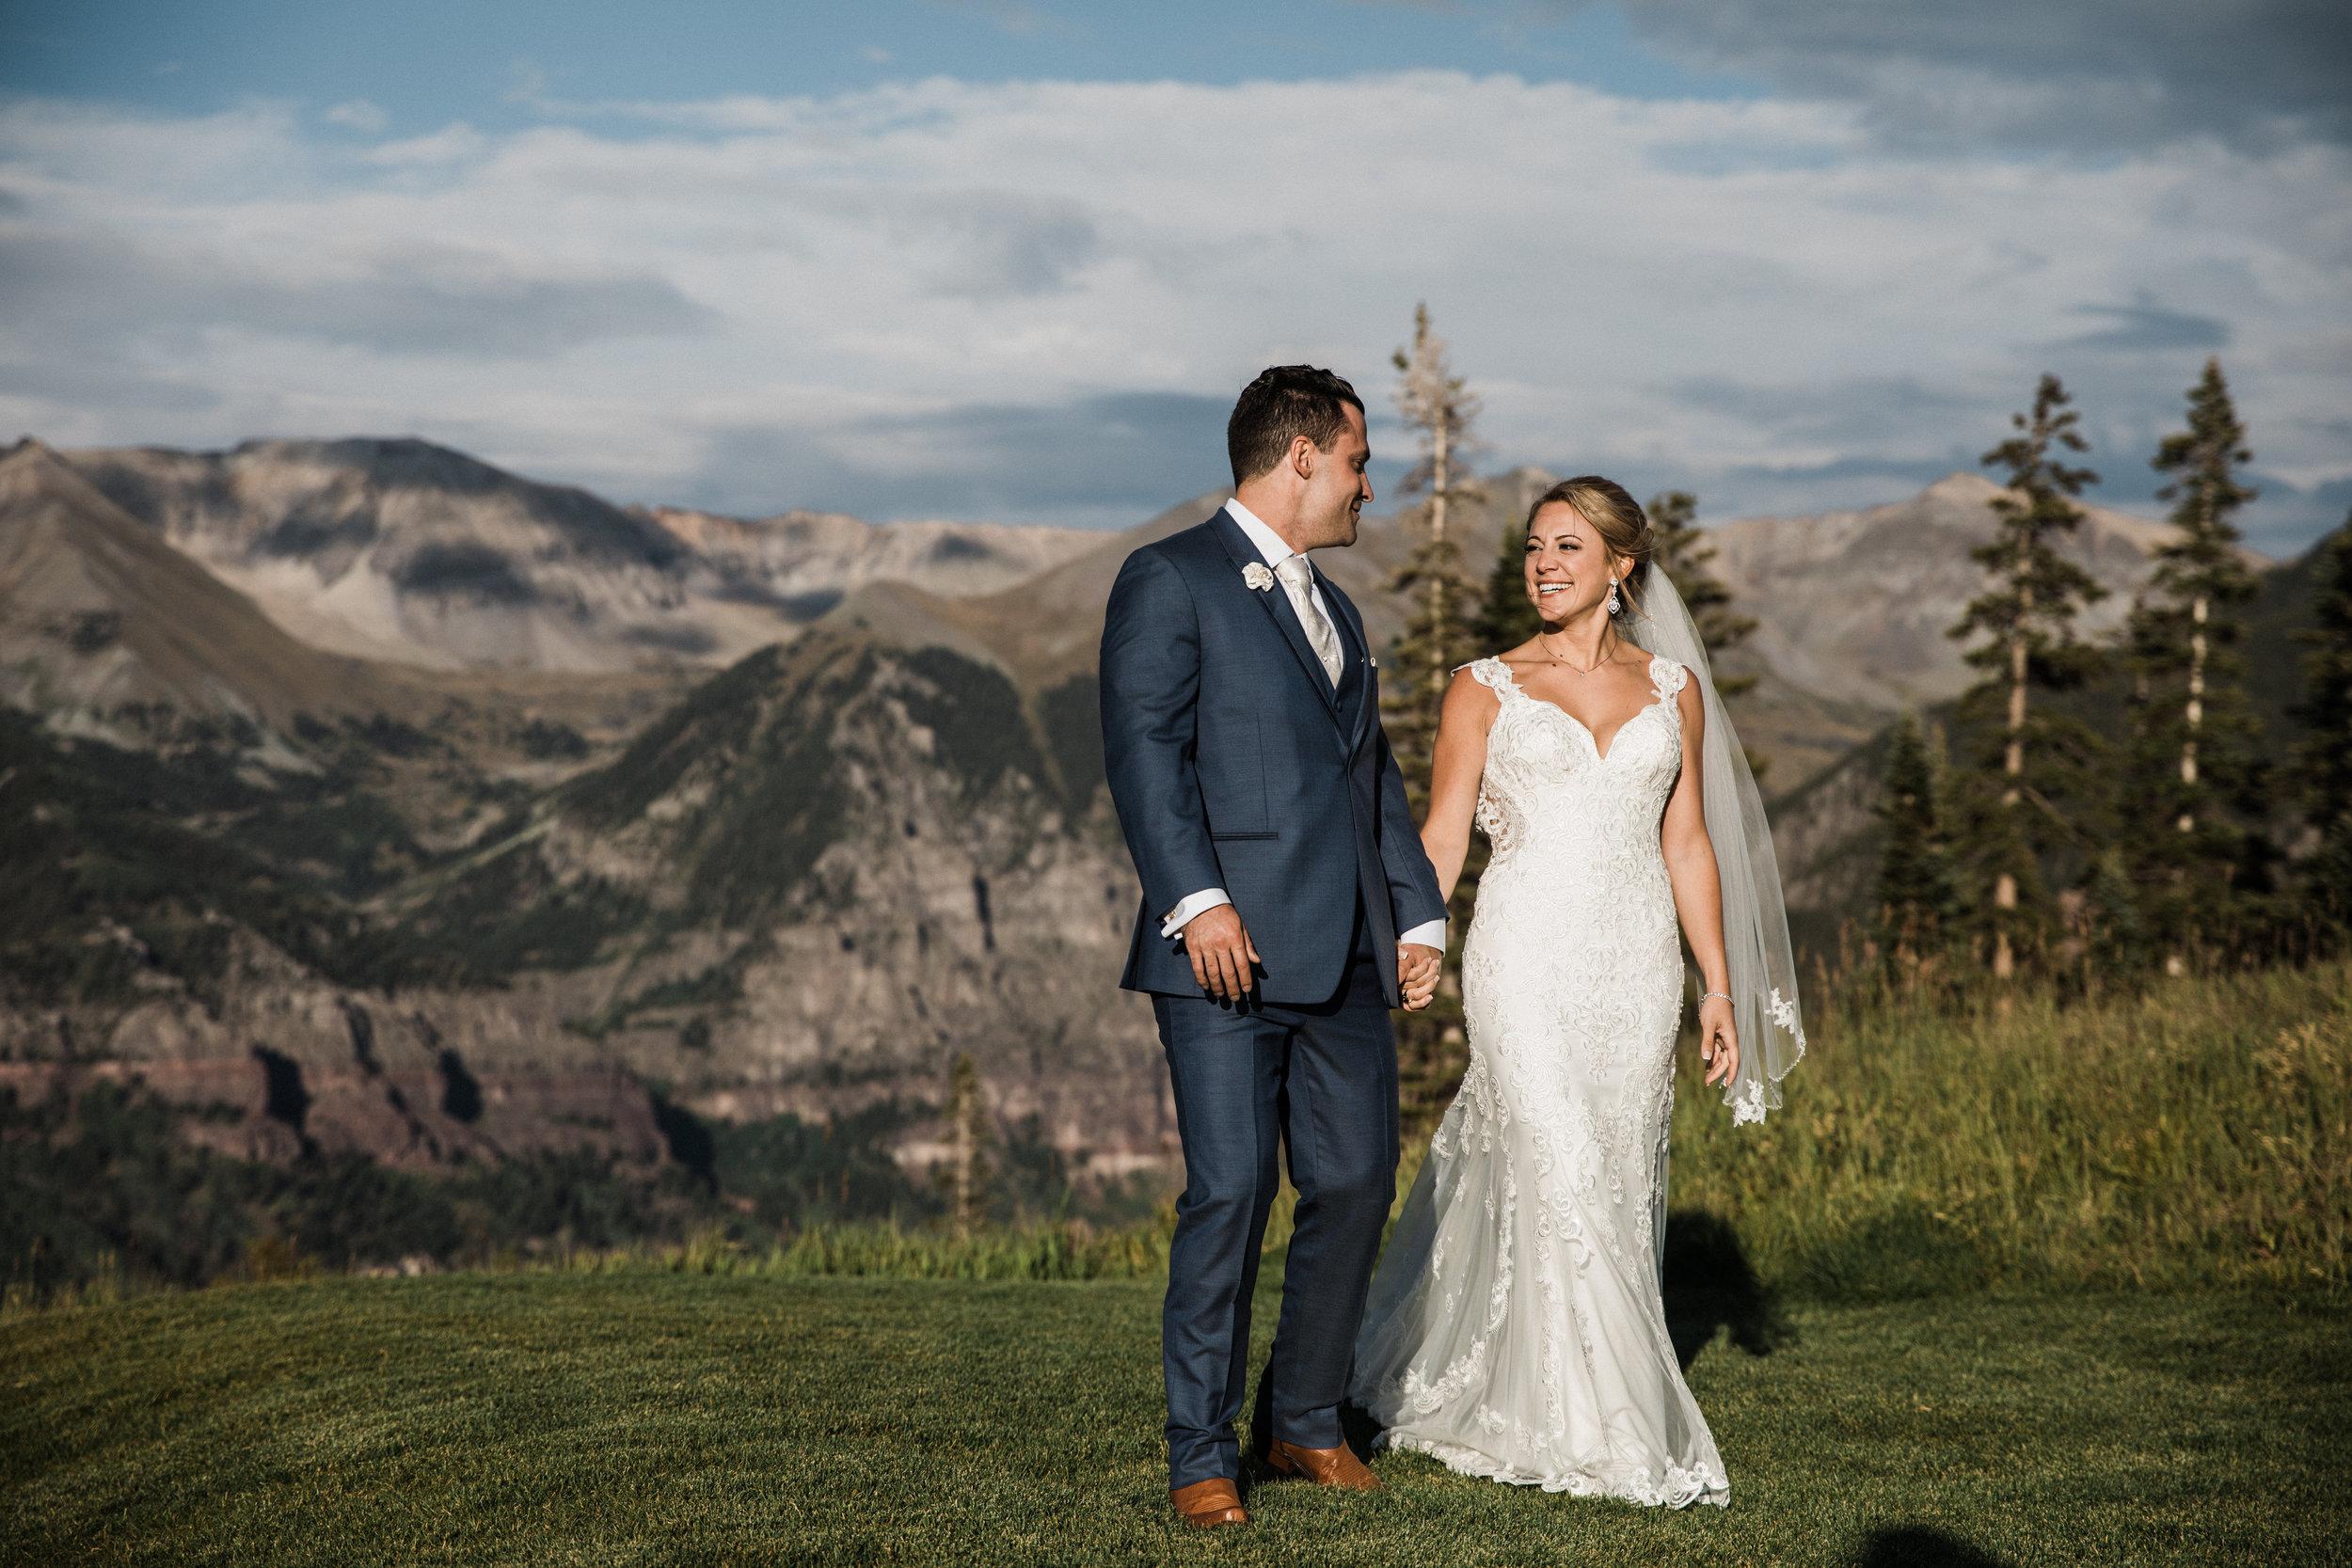 leahandashton-telluride-wedding-photography-0074.jpg